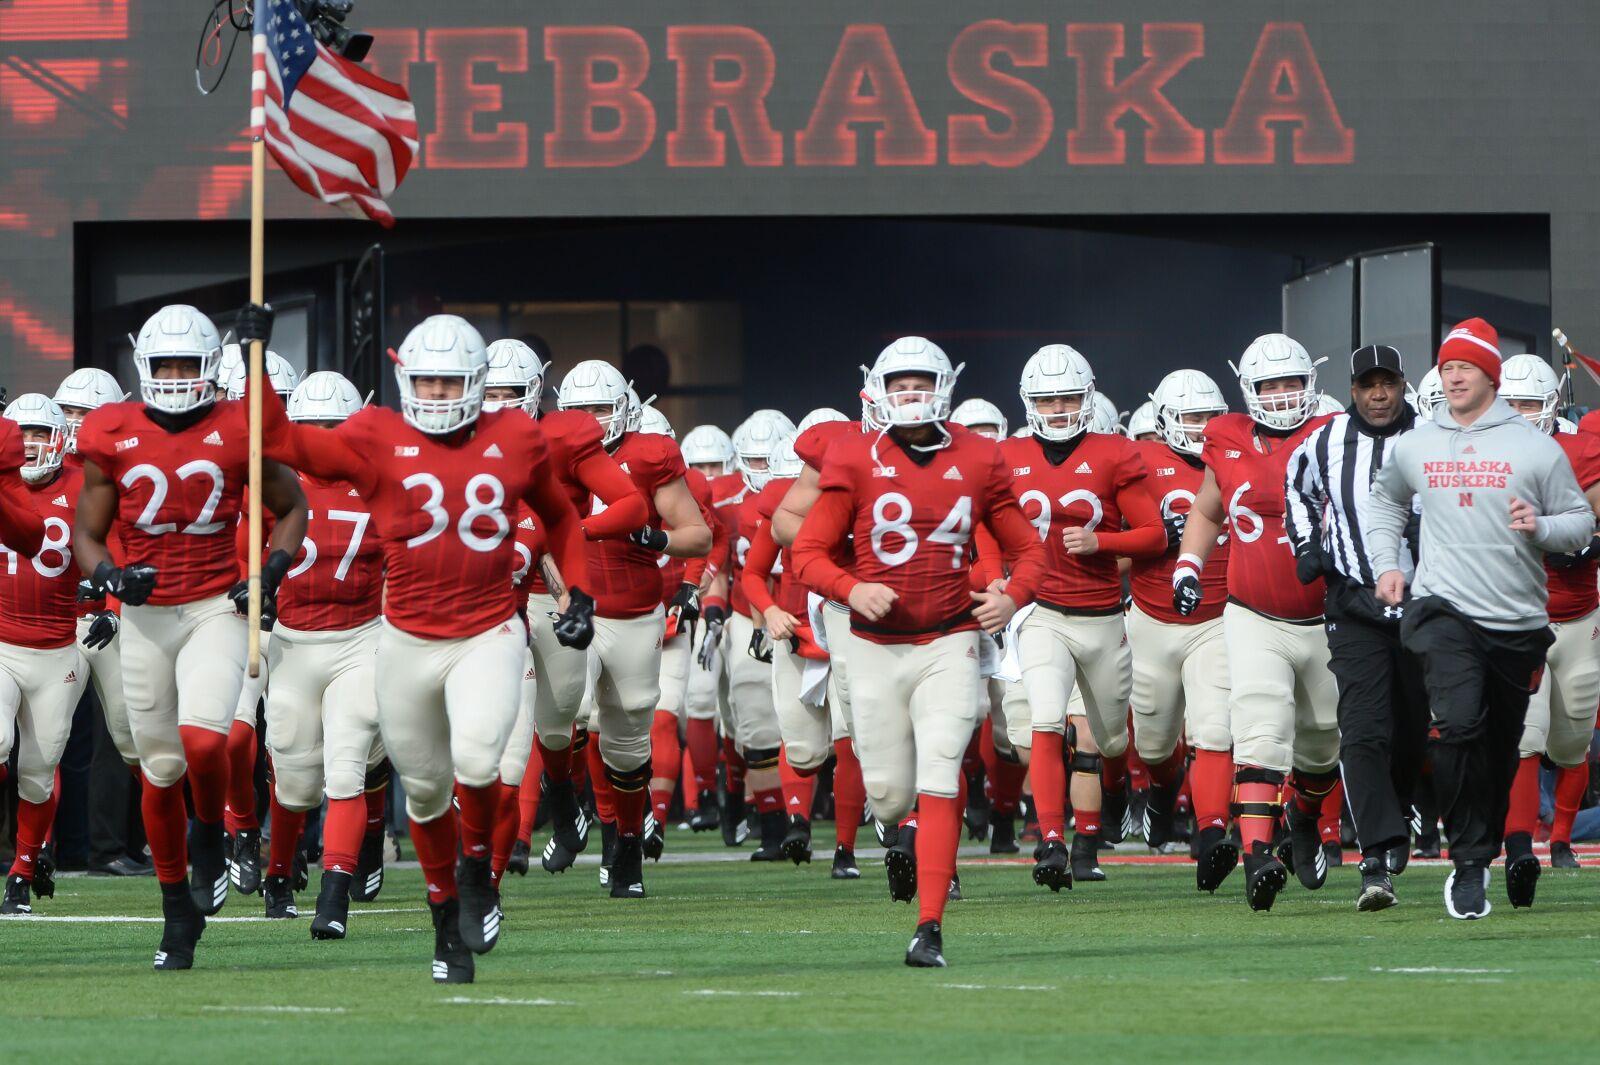 Nebraska Football: Mosai Newsom ready to make impact for ...